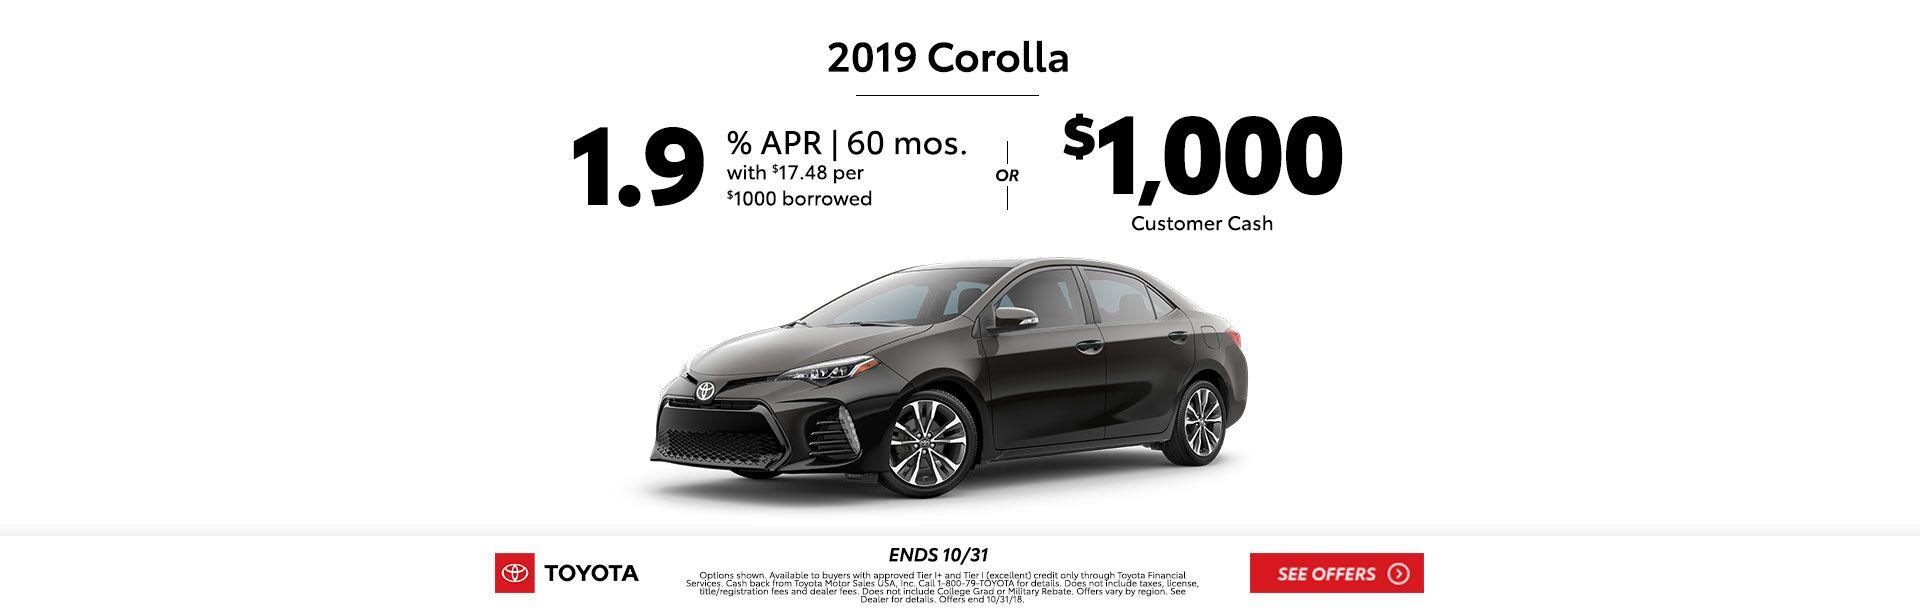 Corolla Customer Cash Oct 2018